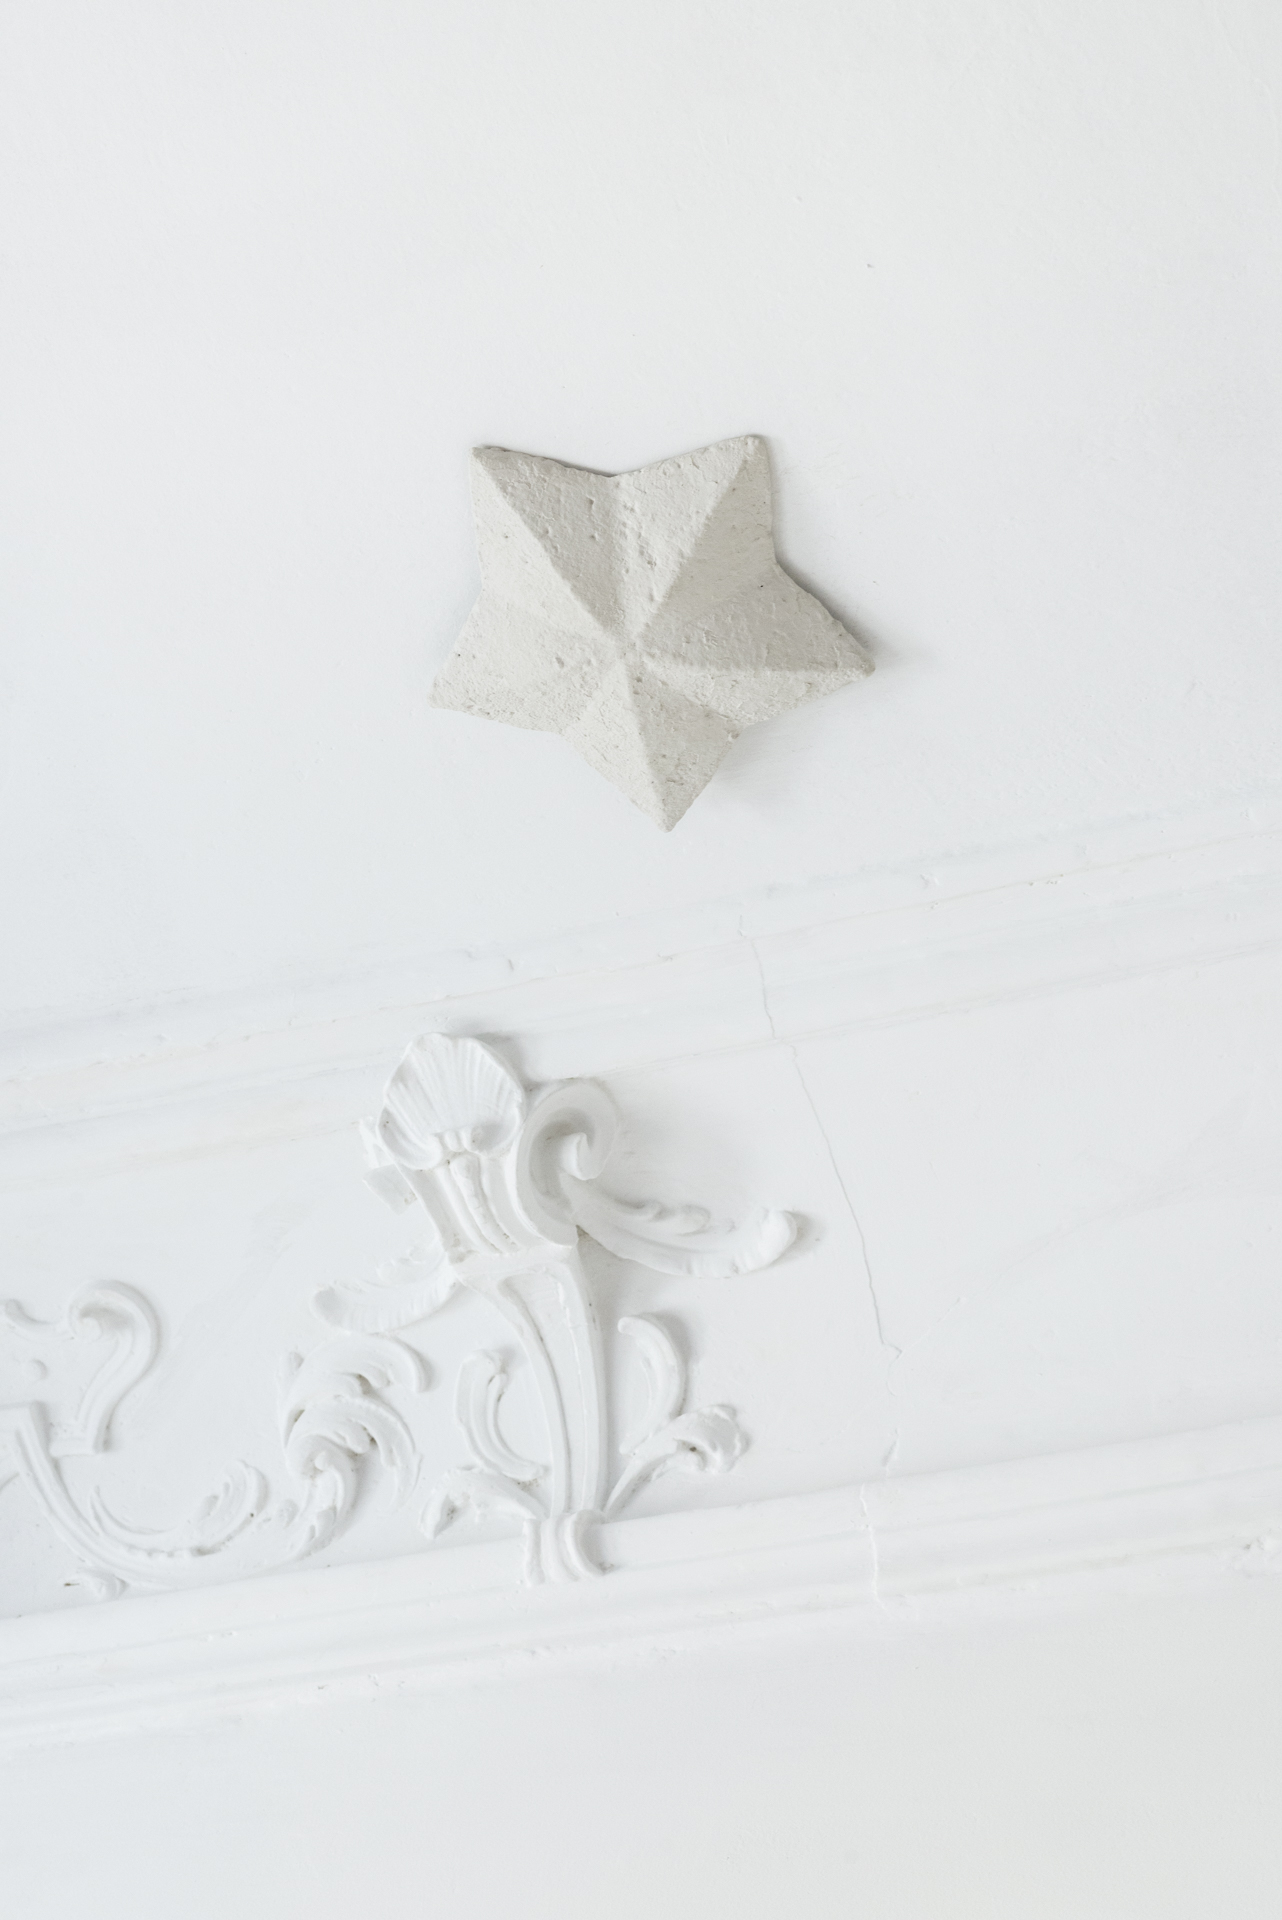 Natalia Wiśniewska, The sky's the limit of temptation, 2015, instalacja, gips